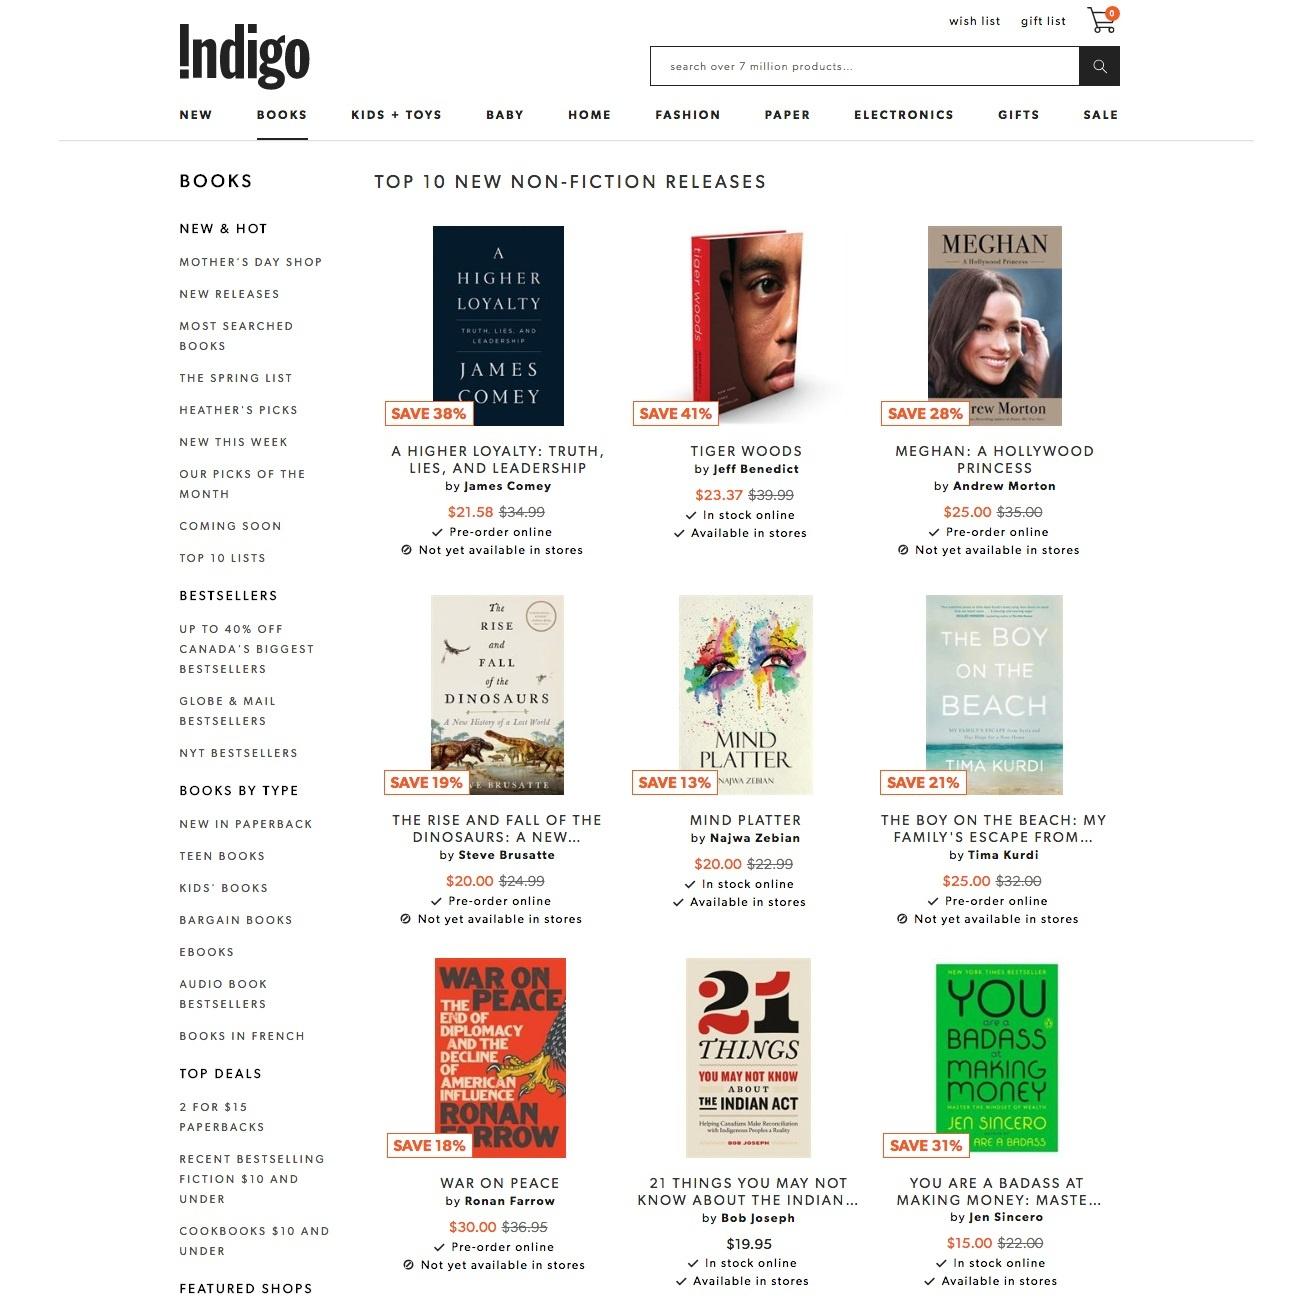 Indigo Top 10 Bestseller List